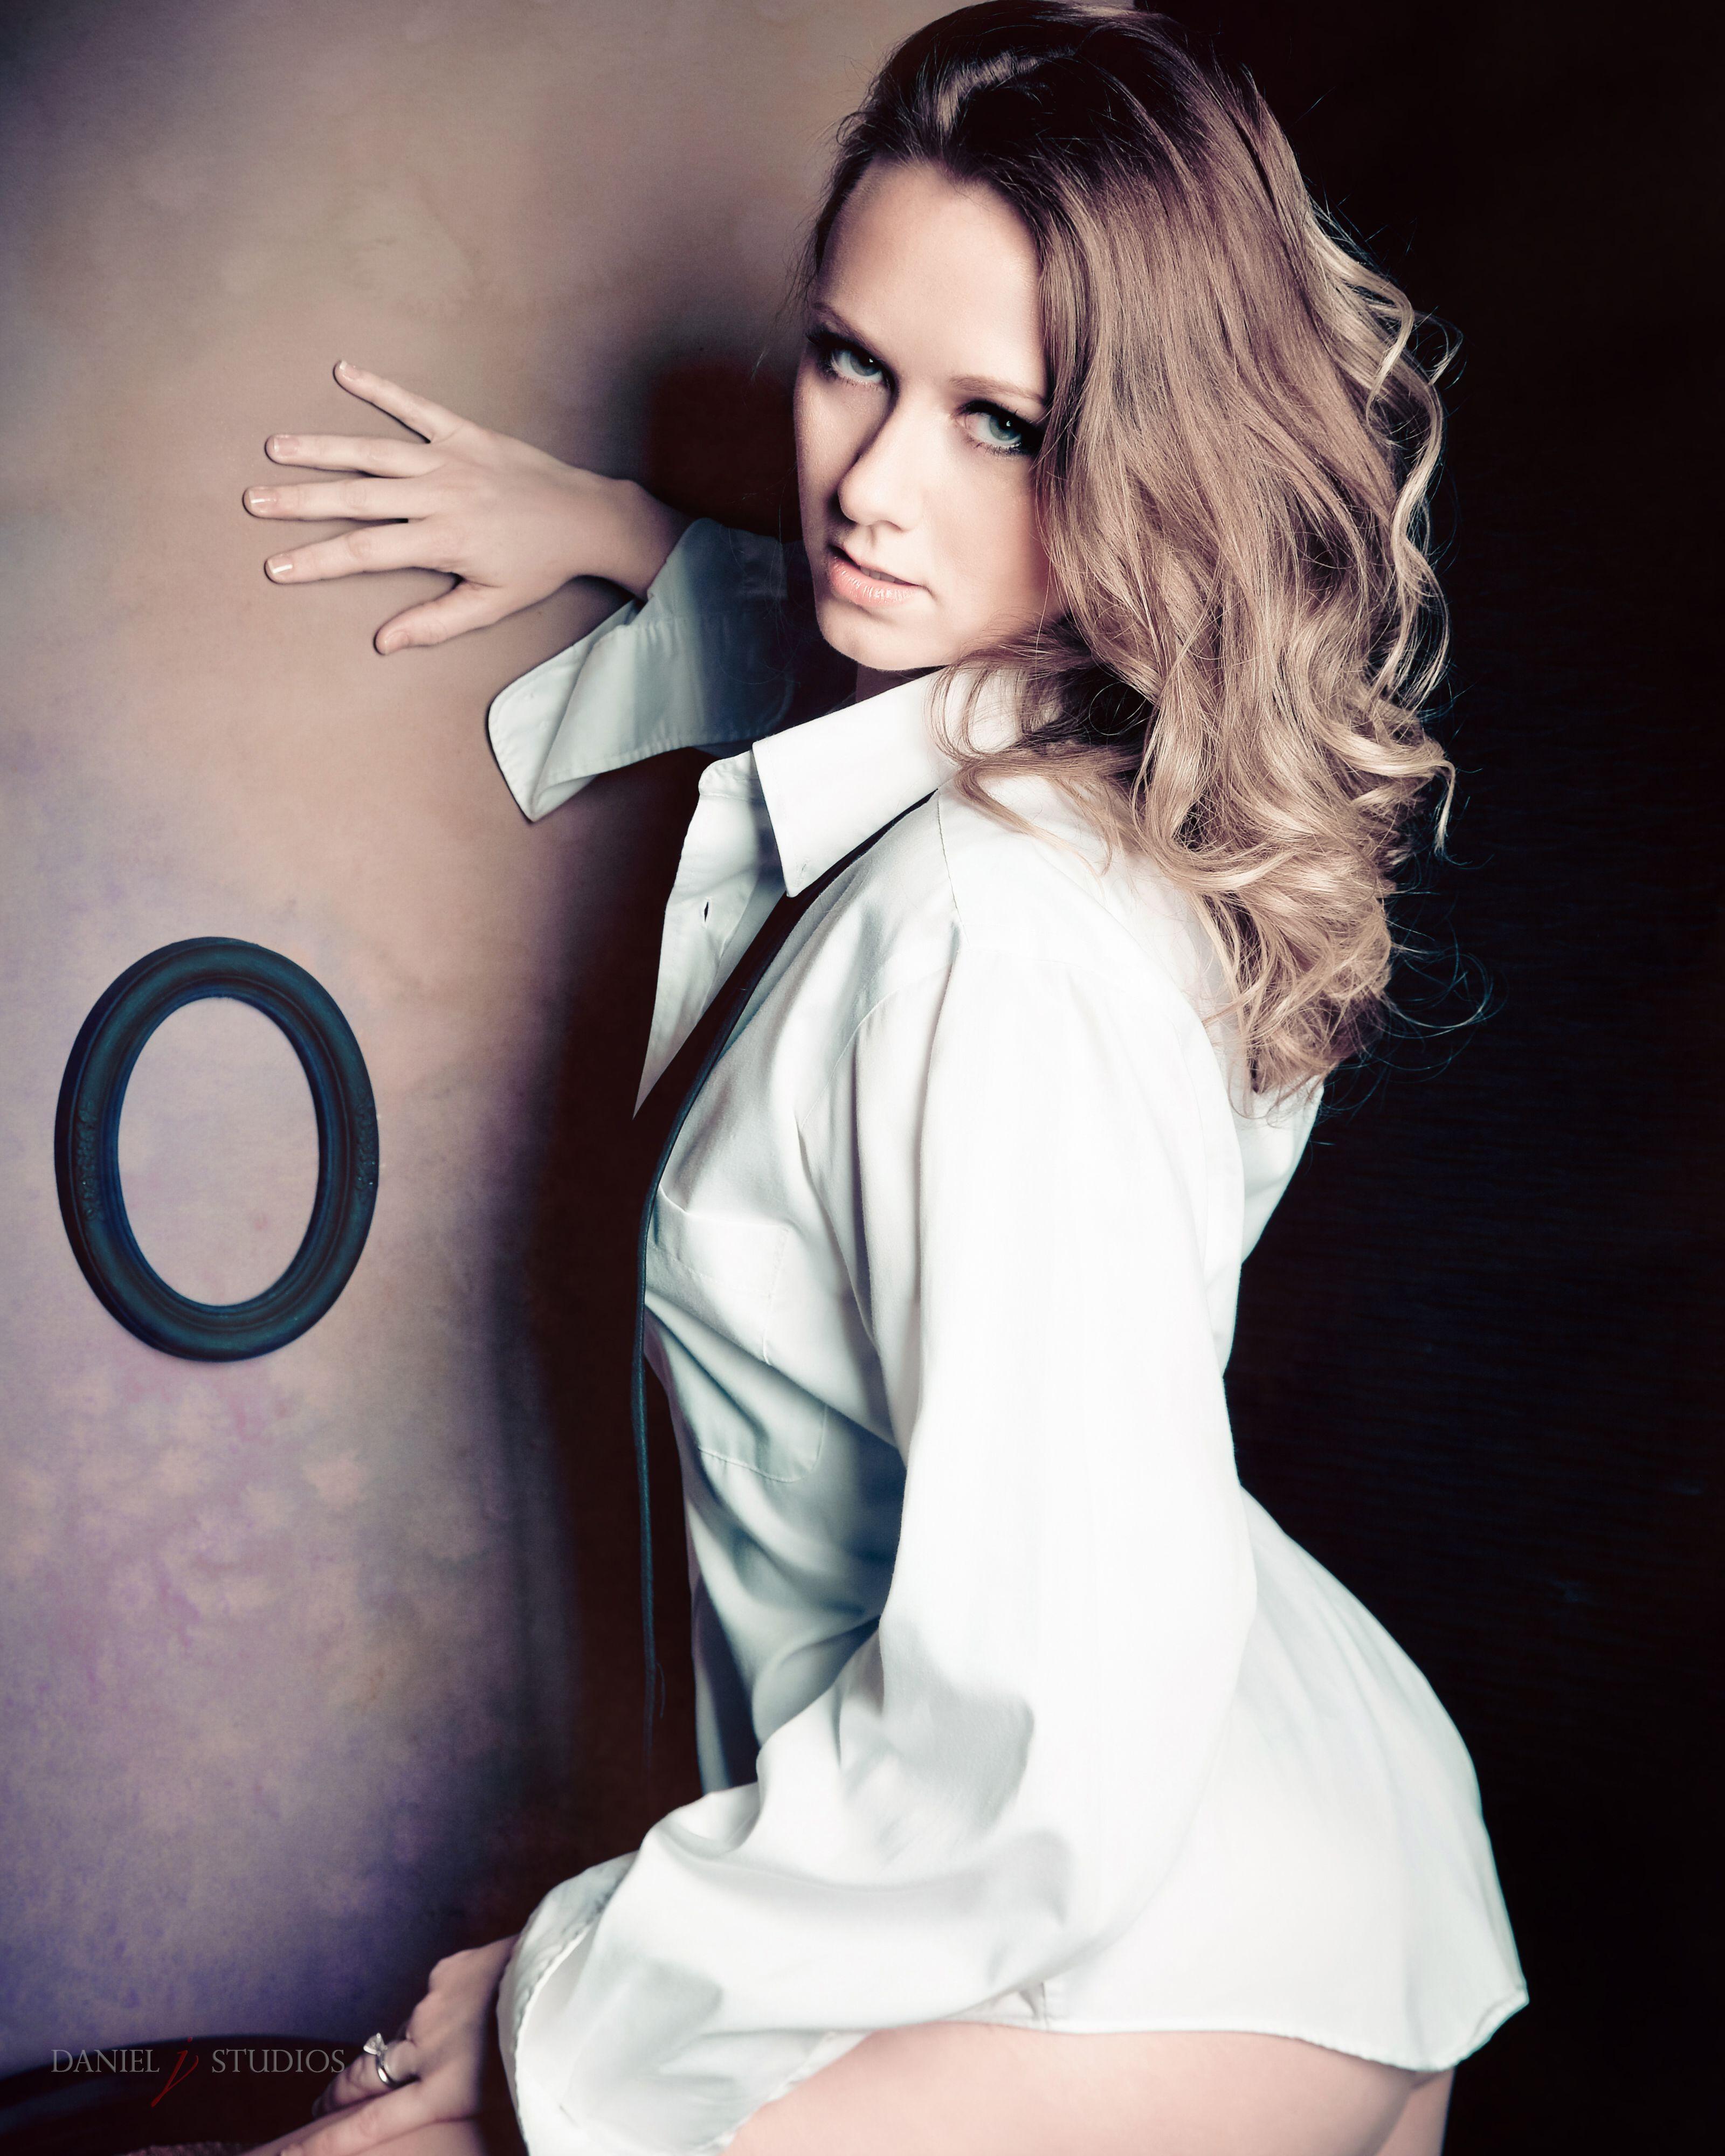 'After Hours' #boudoir #glamour #lingerie #boudoirphotography #Boudoirposes #bestboudoir #intimatephotography #sexy #sexyphotography #raleighboudoir #danieljstudios #danhadley